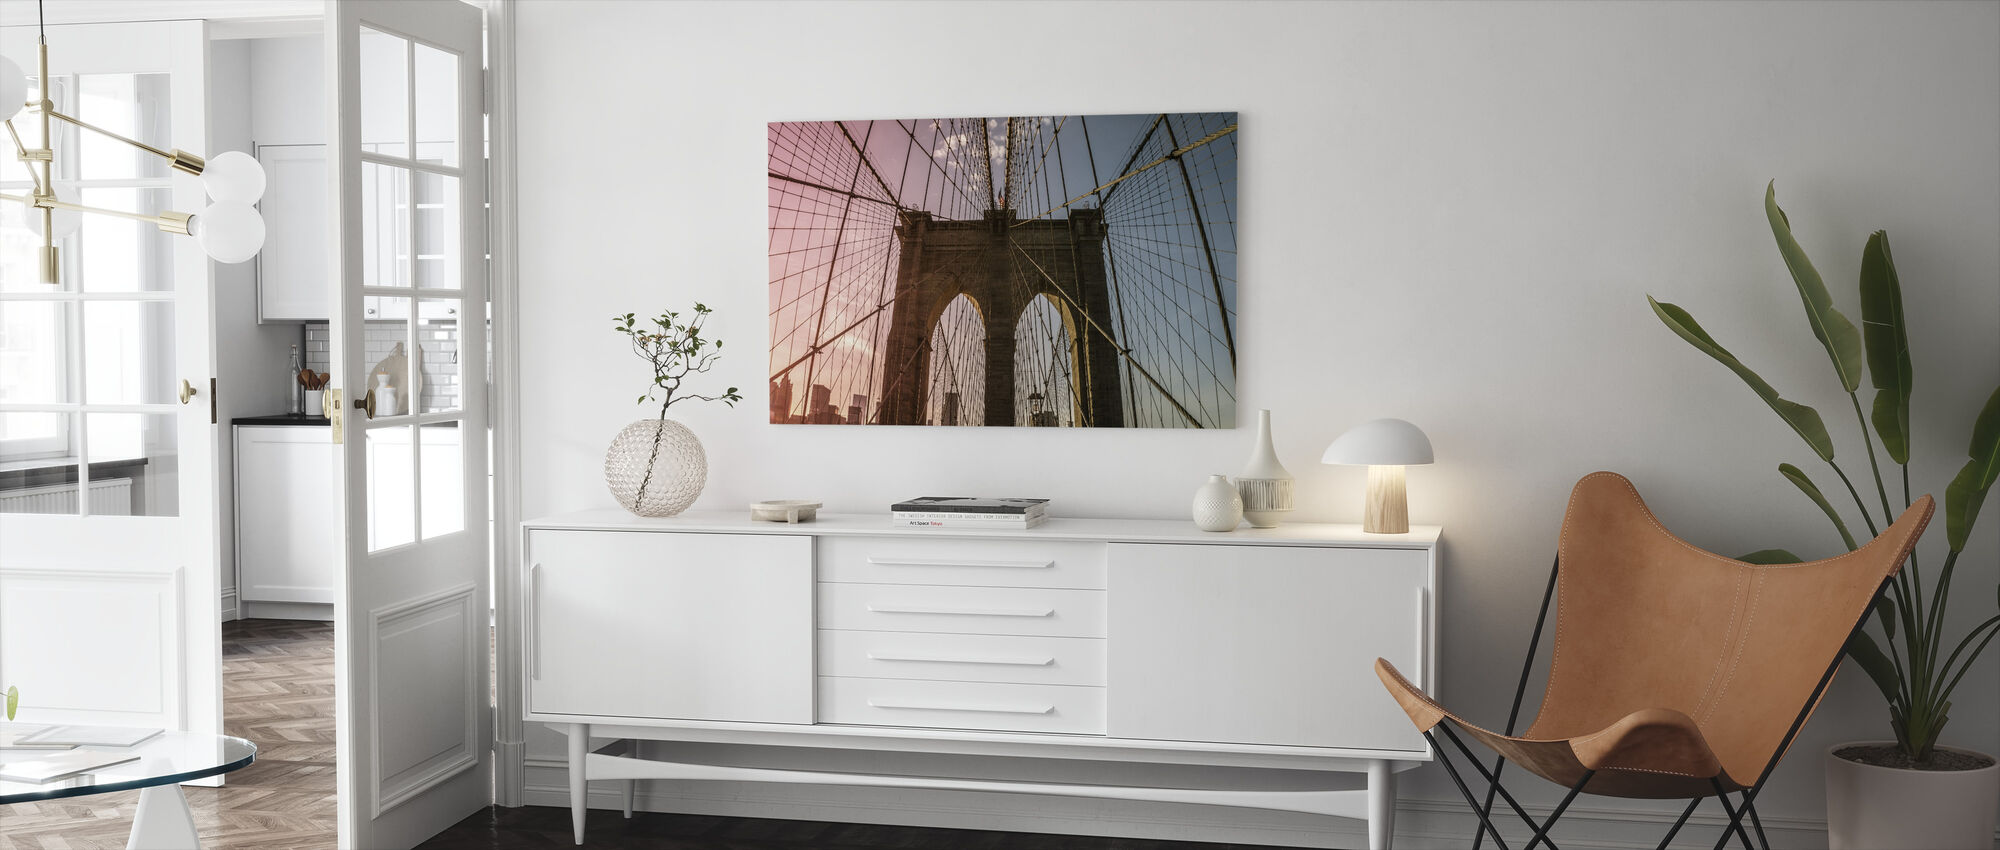 Brooklyn Brug - Canvas print - Woonkamer